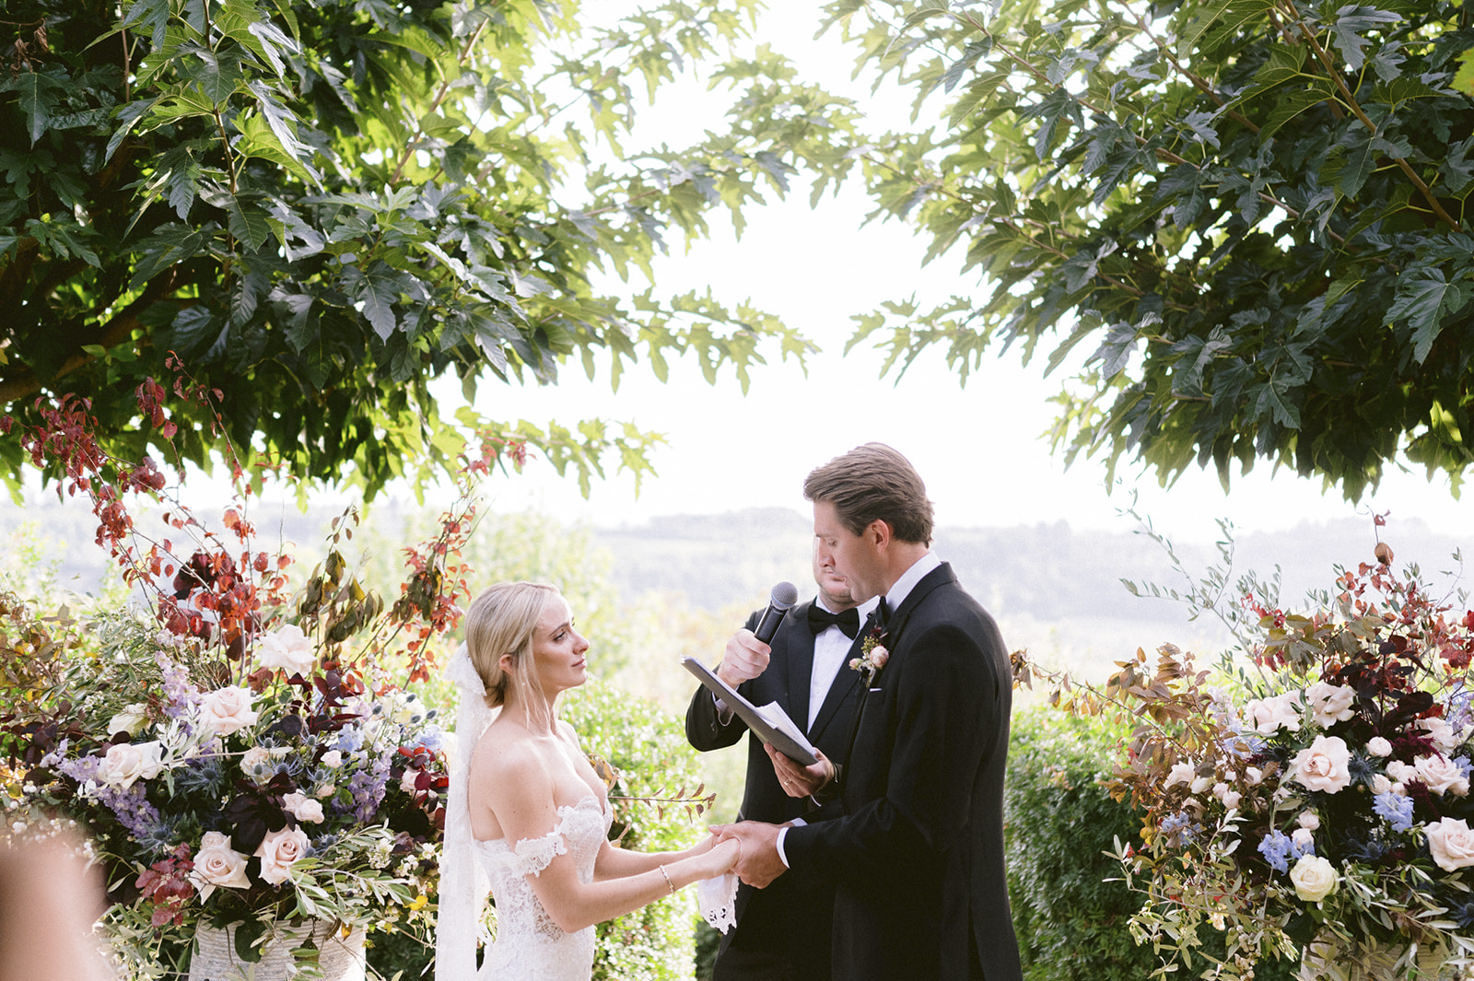 Wedding ceremony at Borgo Petrognano